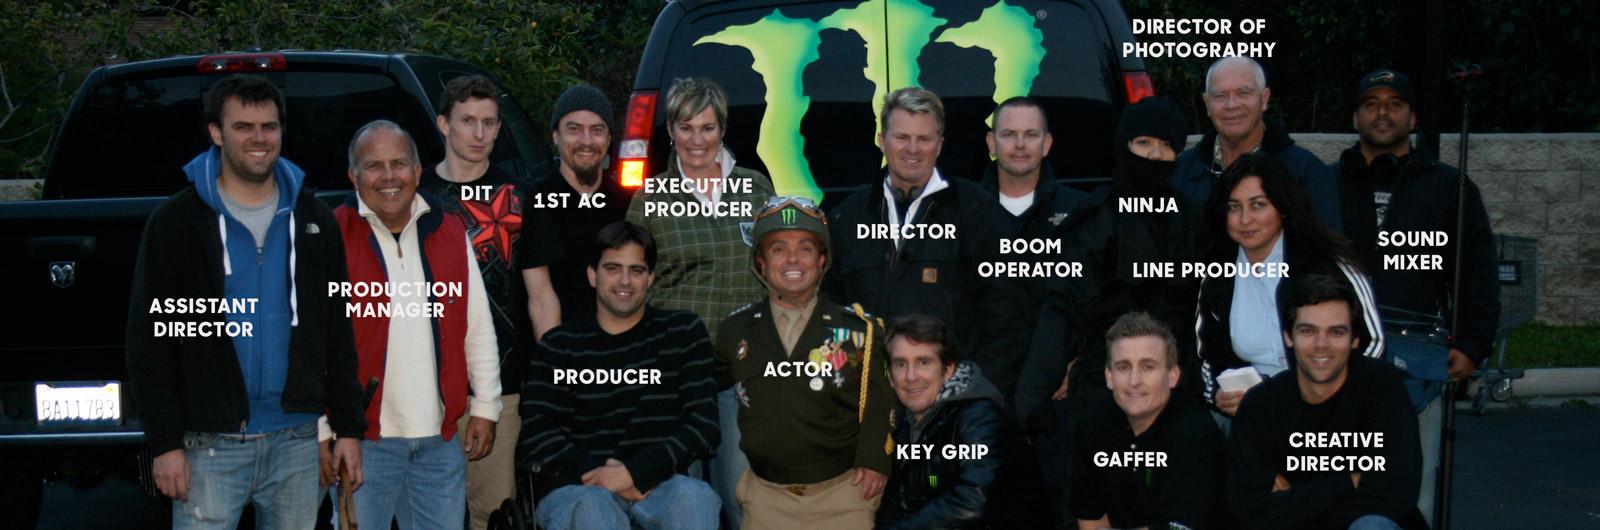 Gotham - Cast, Crew and Credits - TV.com